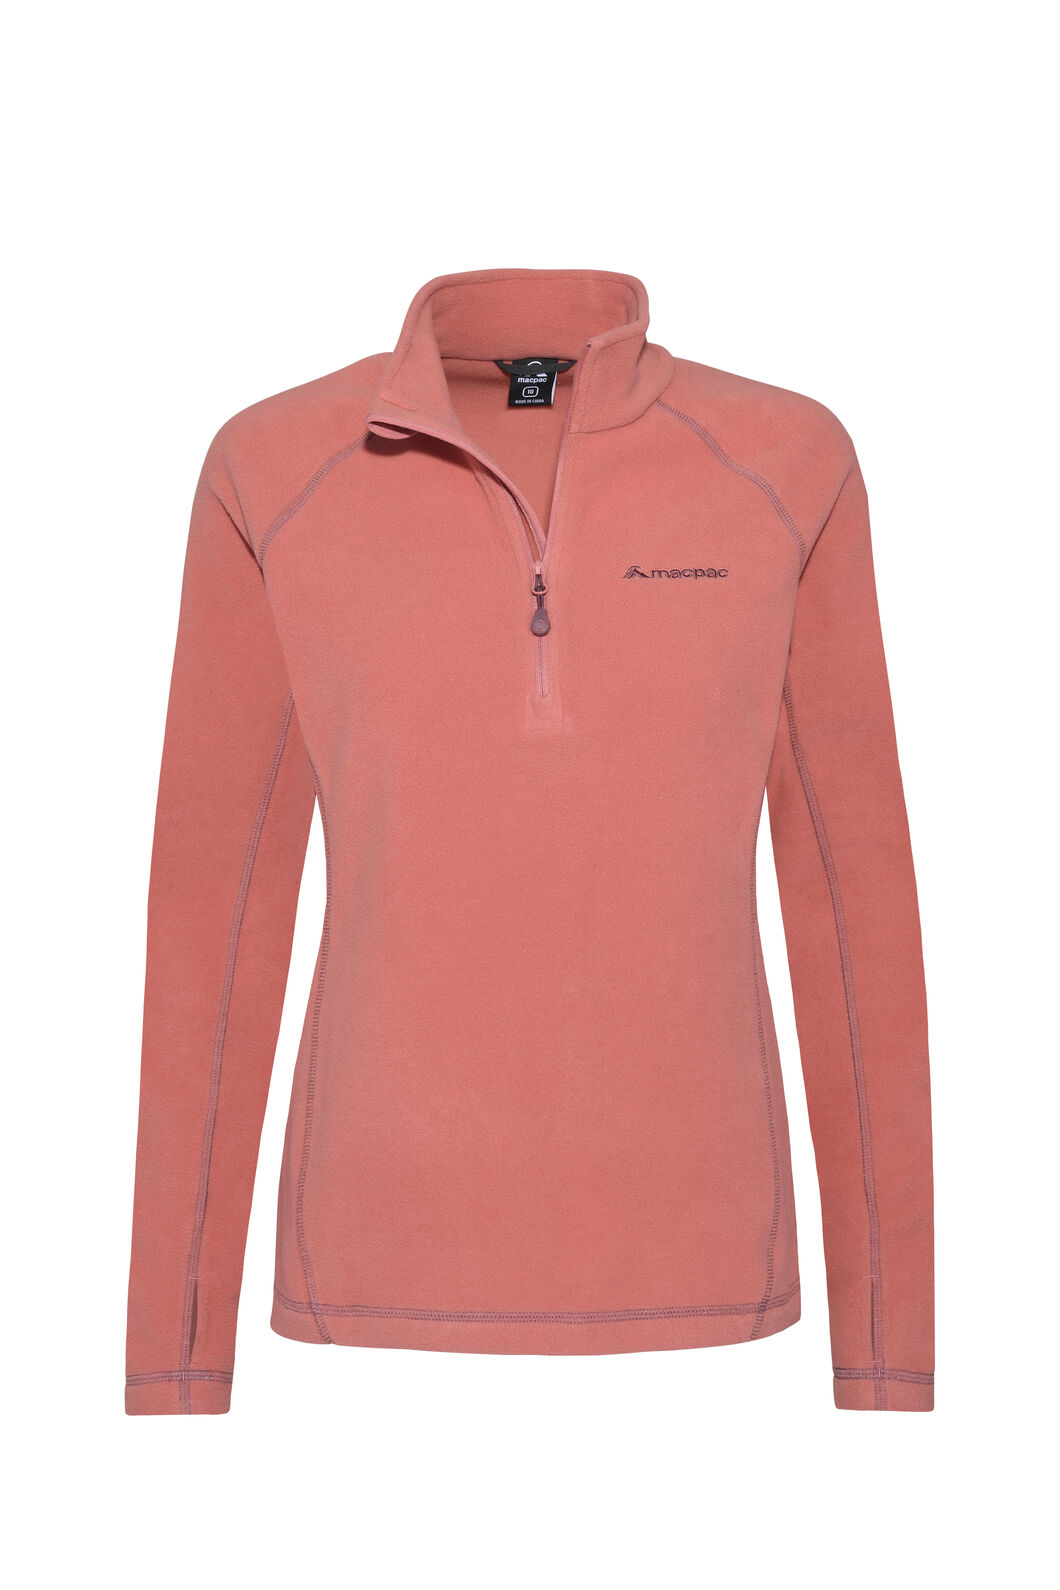 Macpac Tui Polartec® Micro Fleece® Pullover — Women's, Dusty Cedar, hi-res